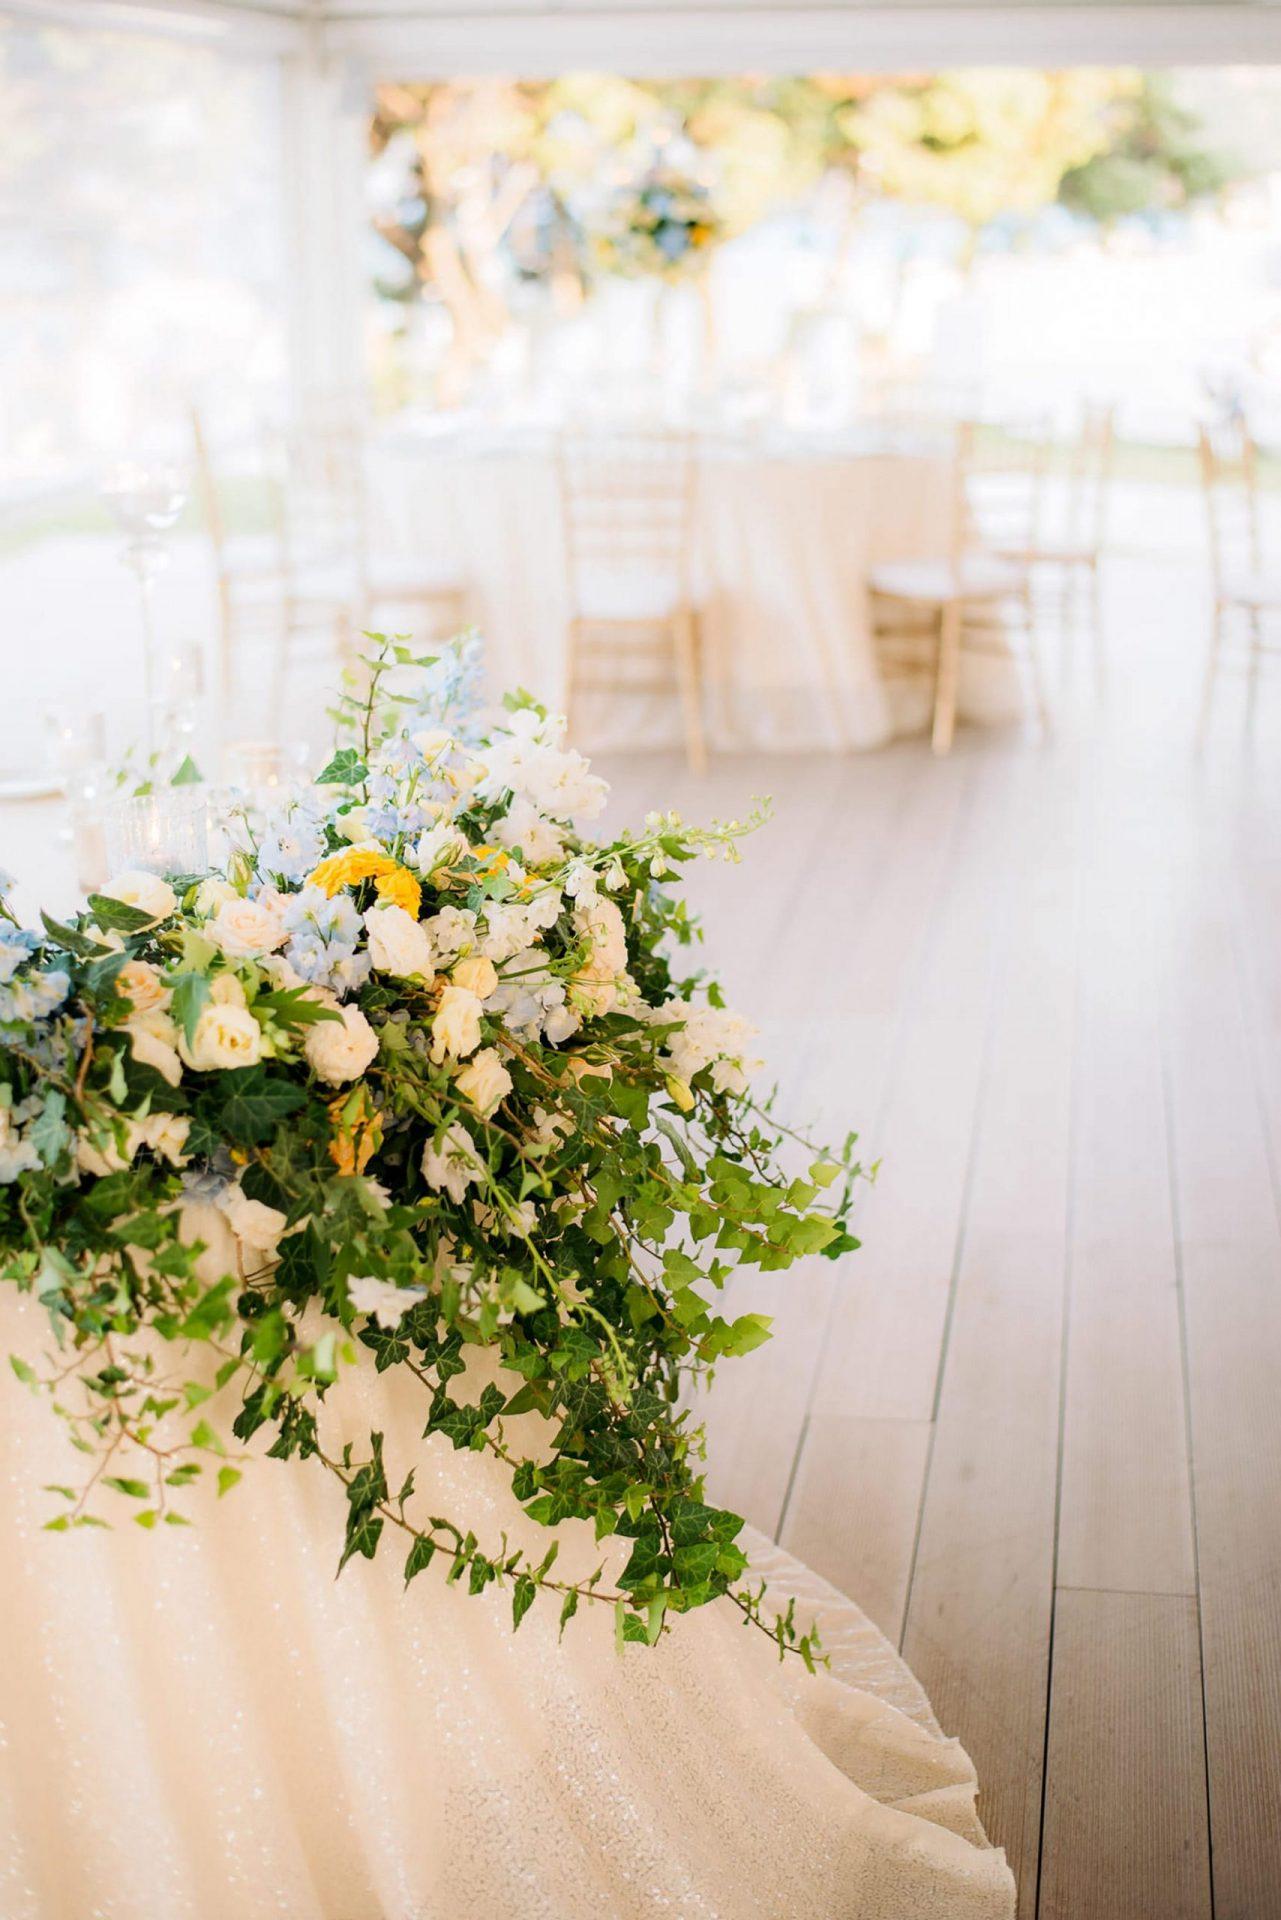 Linda and Enrico, flowers arrangements